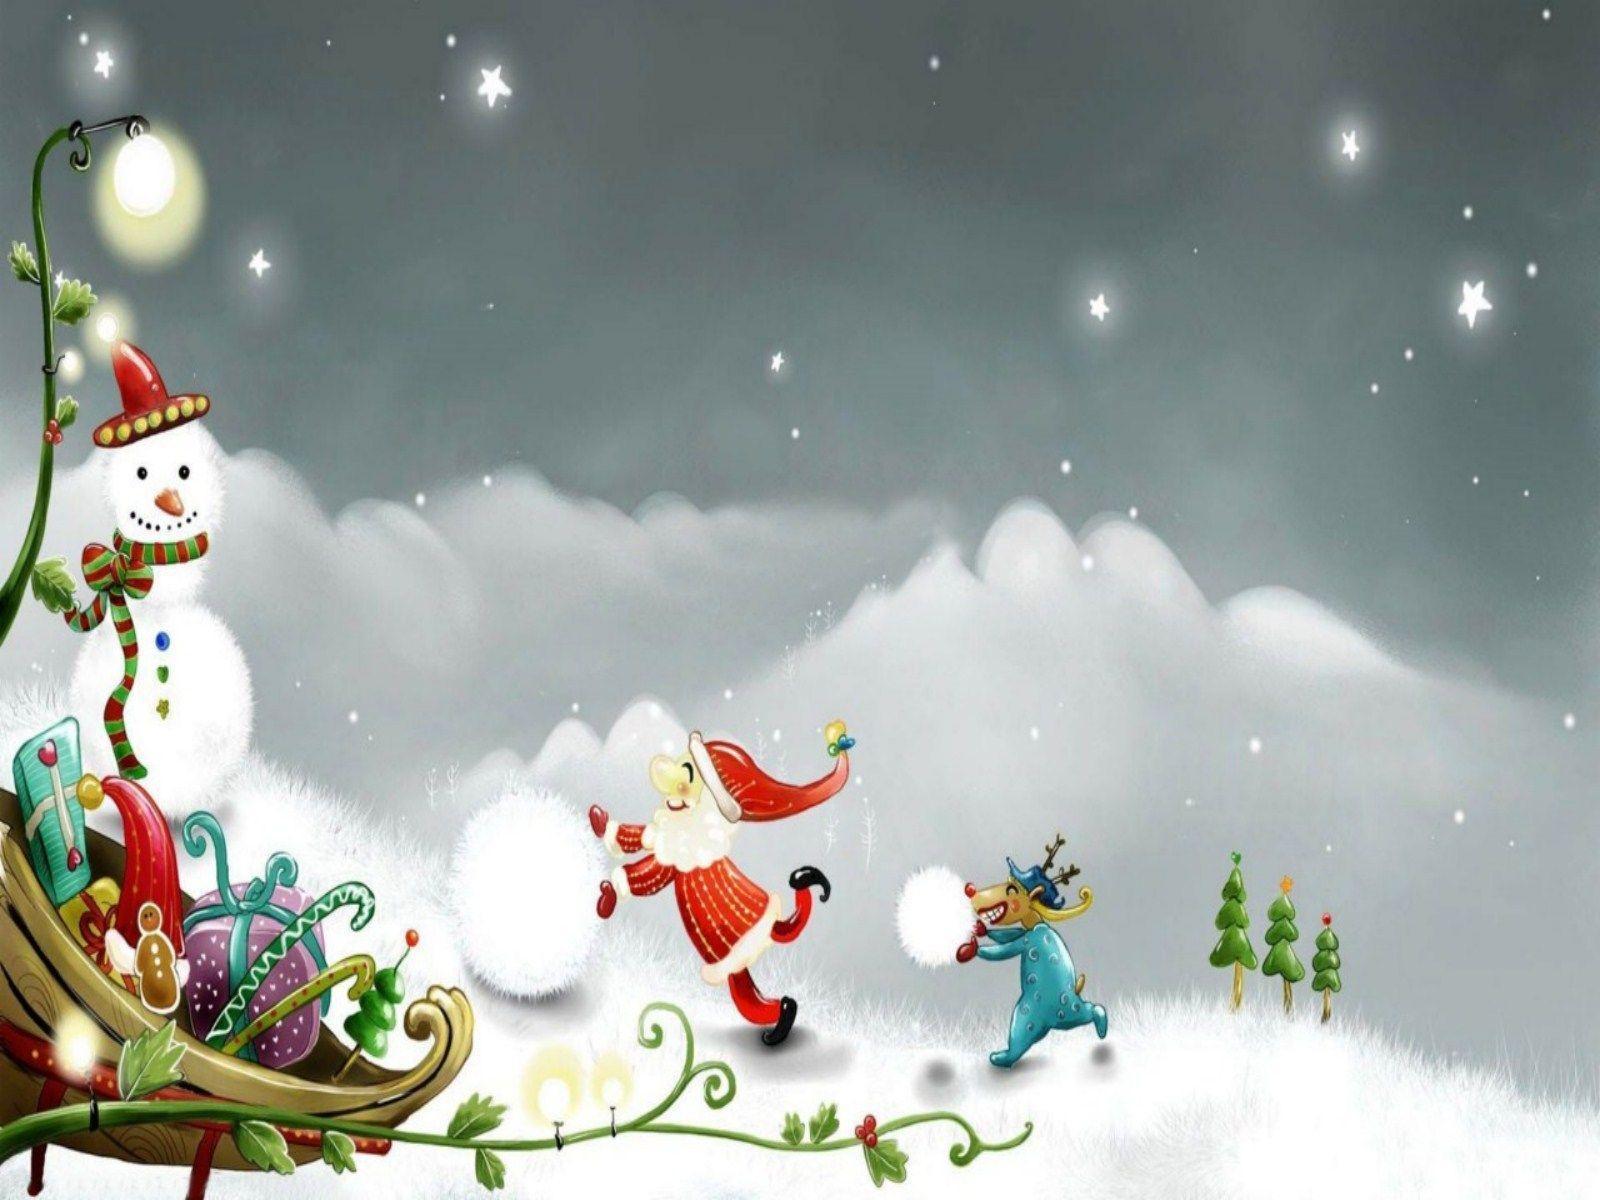 Funny Christmas Desktop Backgrounds - Wallpaper Cave